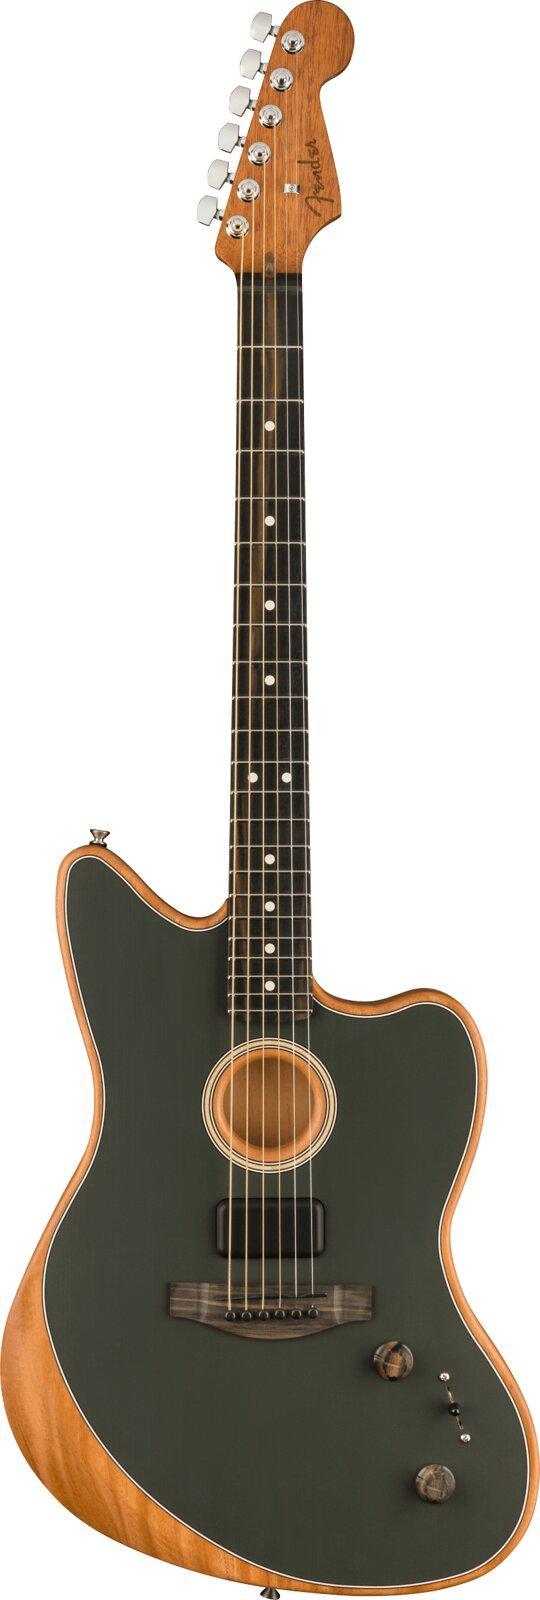 Fender American Acoustasonic Jazzmaster Tungsen Ebony Fingerboard : photo 1